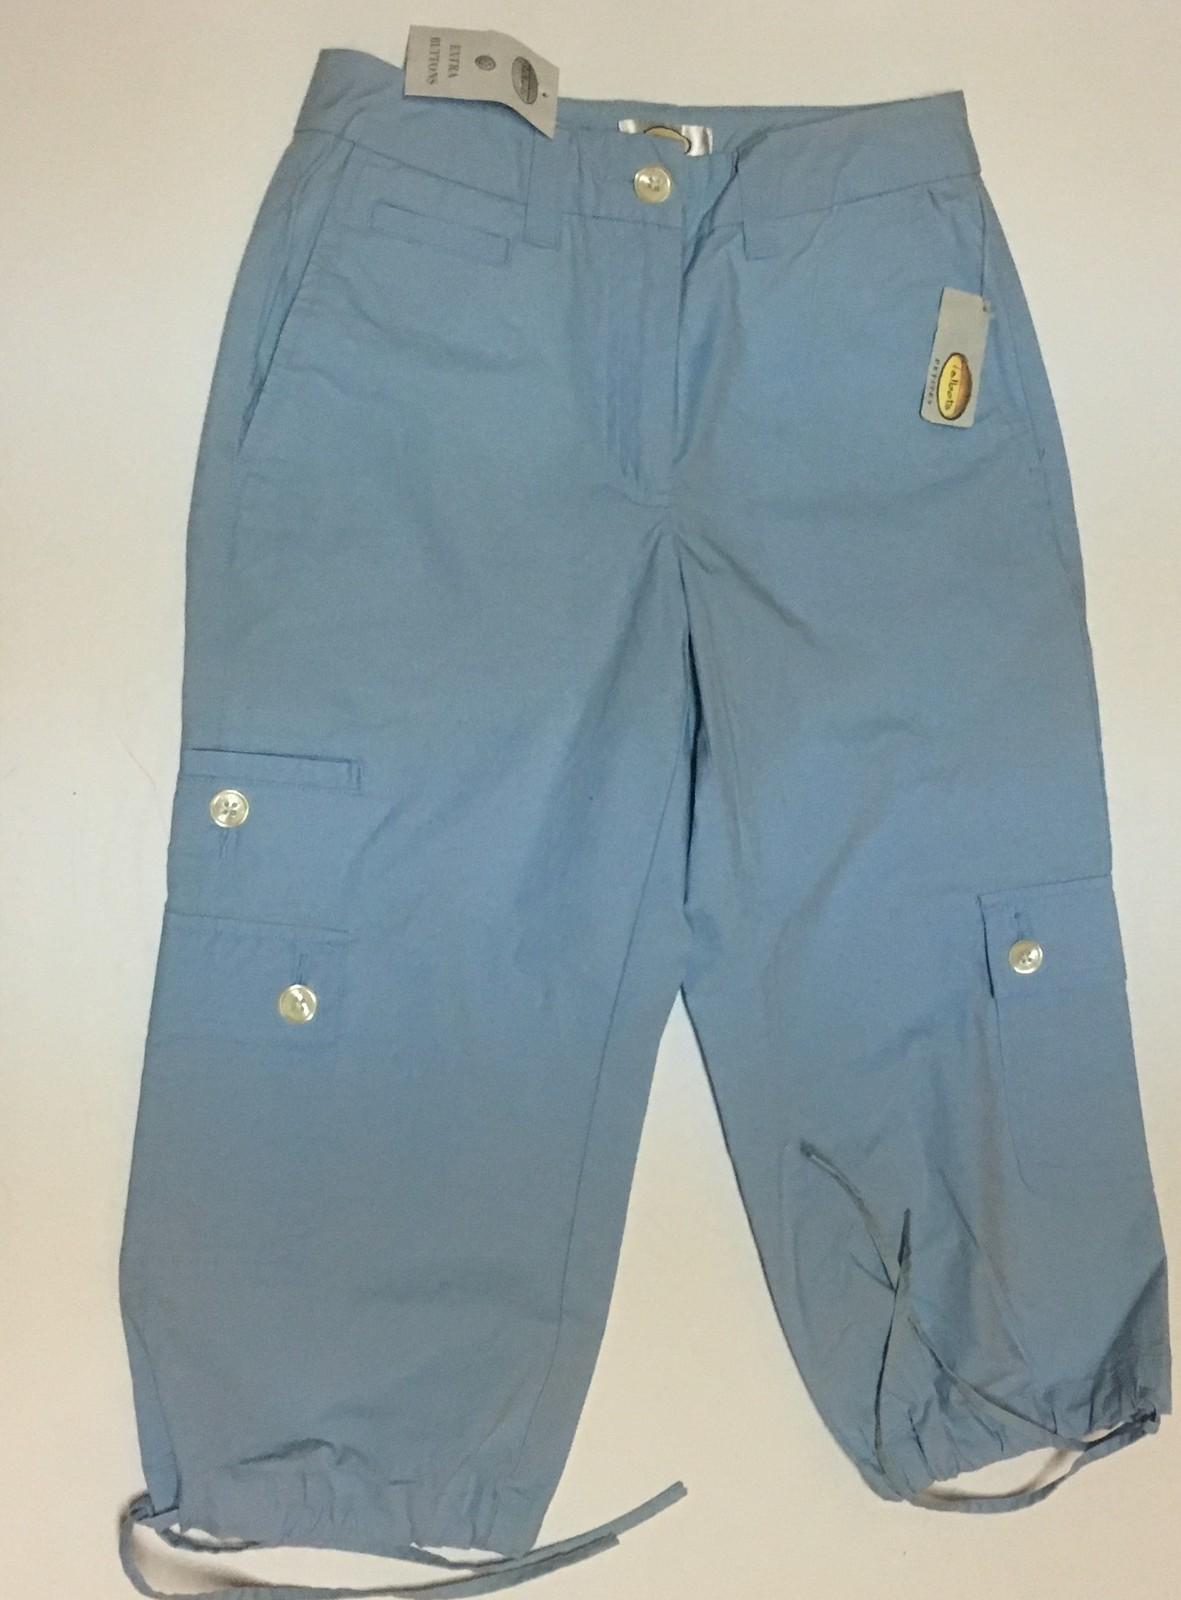 Talbots Baby Blue Capri Petites Stretch SZ 0P NWT